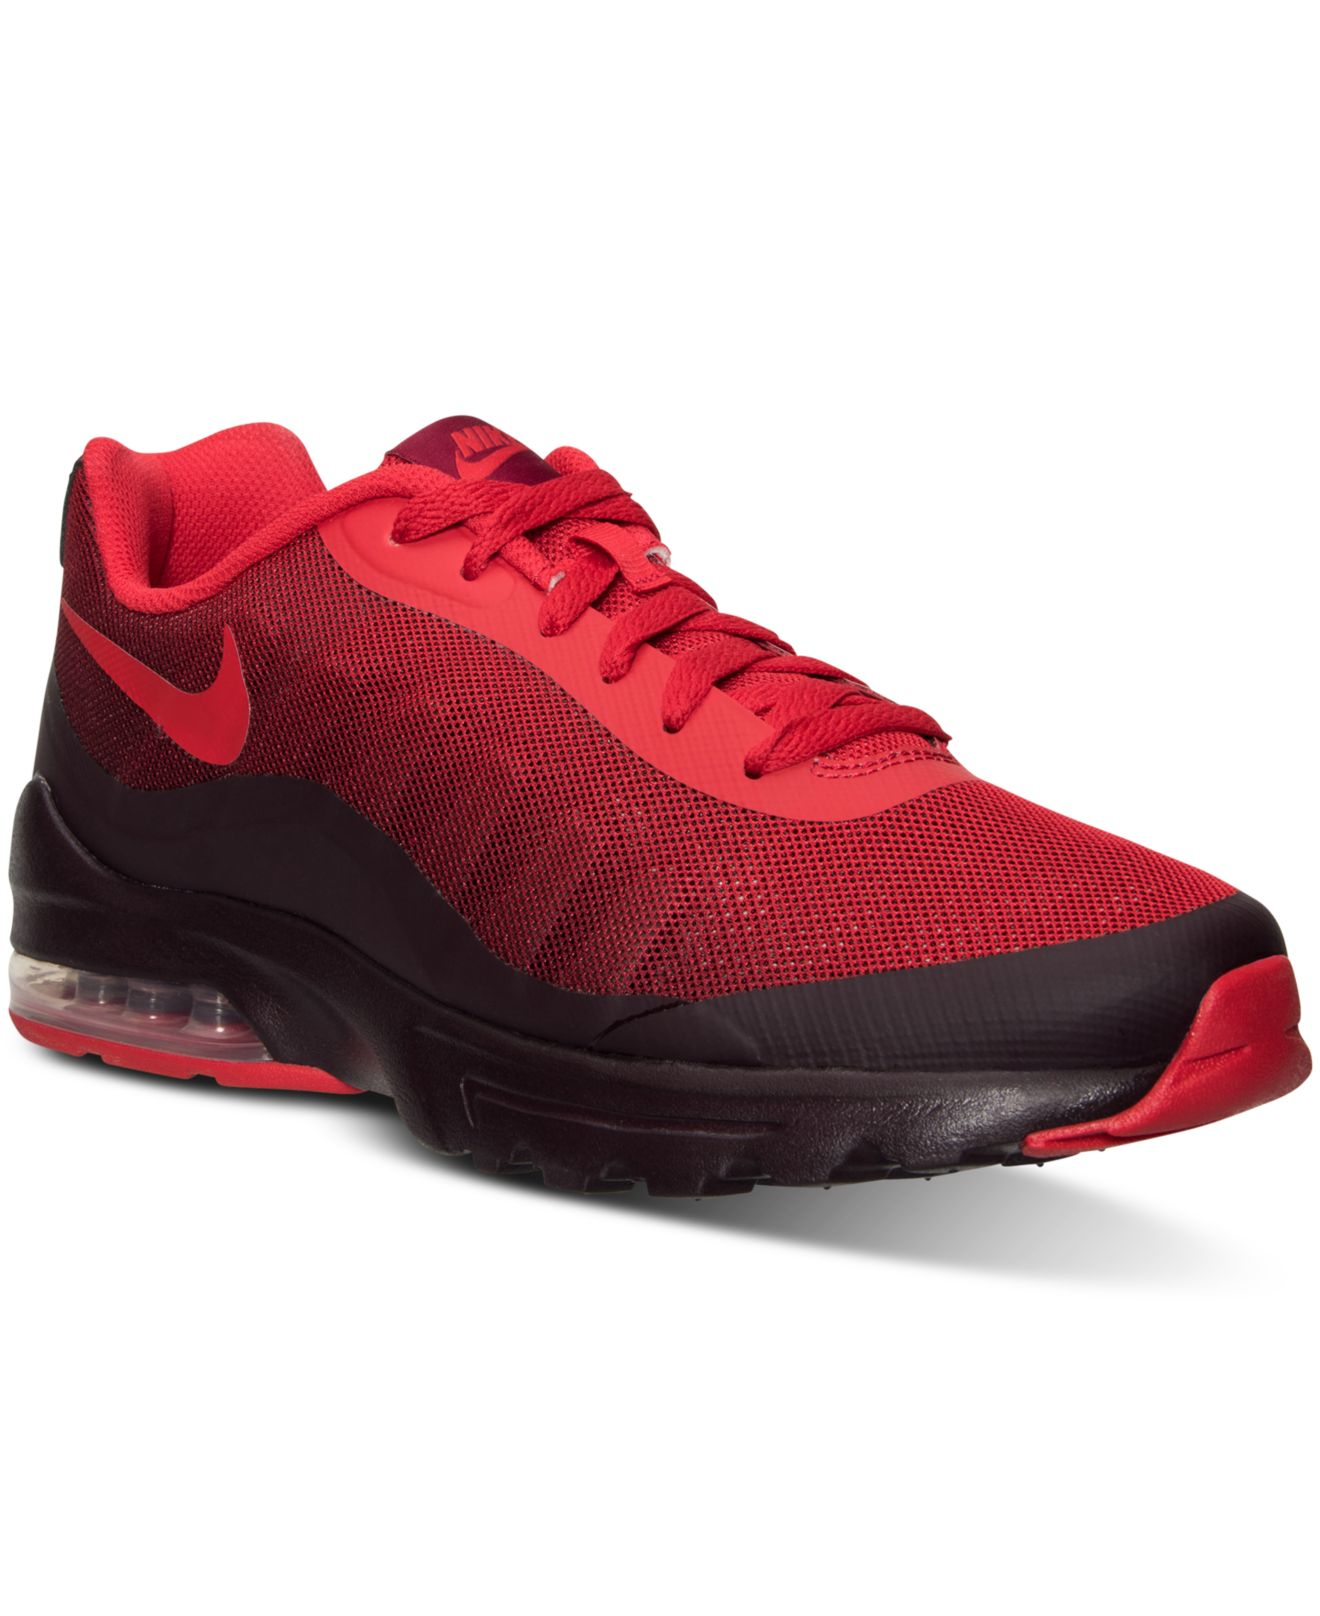 Nike Air Max Invigor Druck Herren Trainingsschuhe Mahagoni